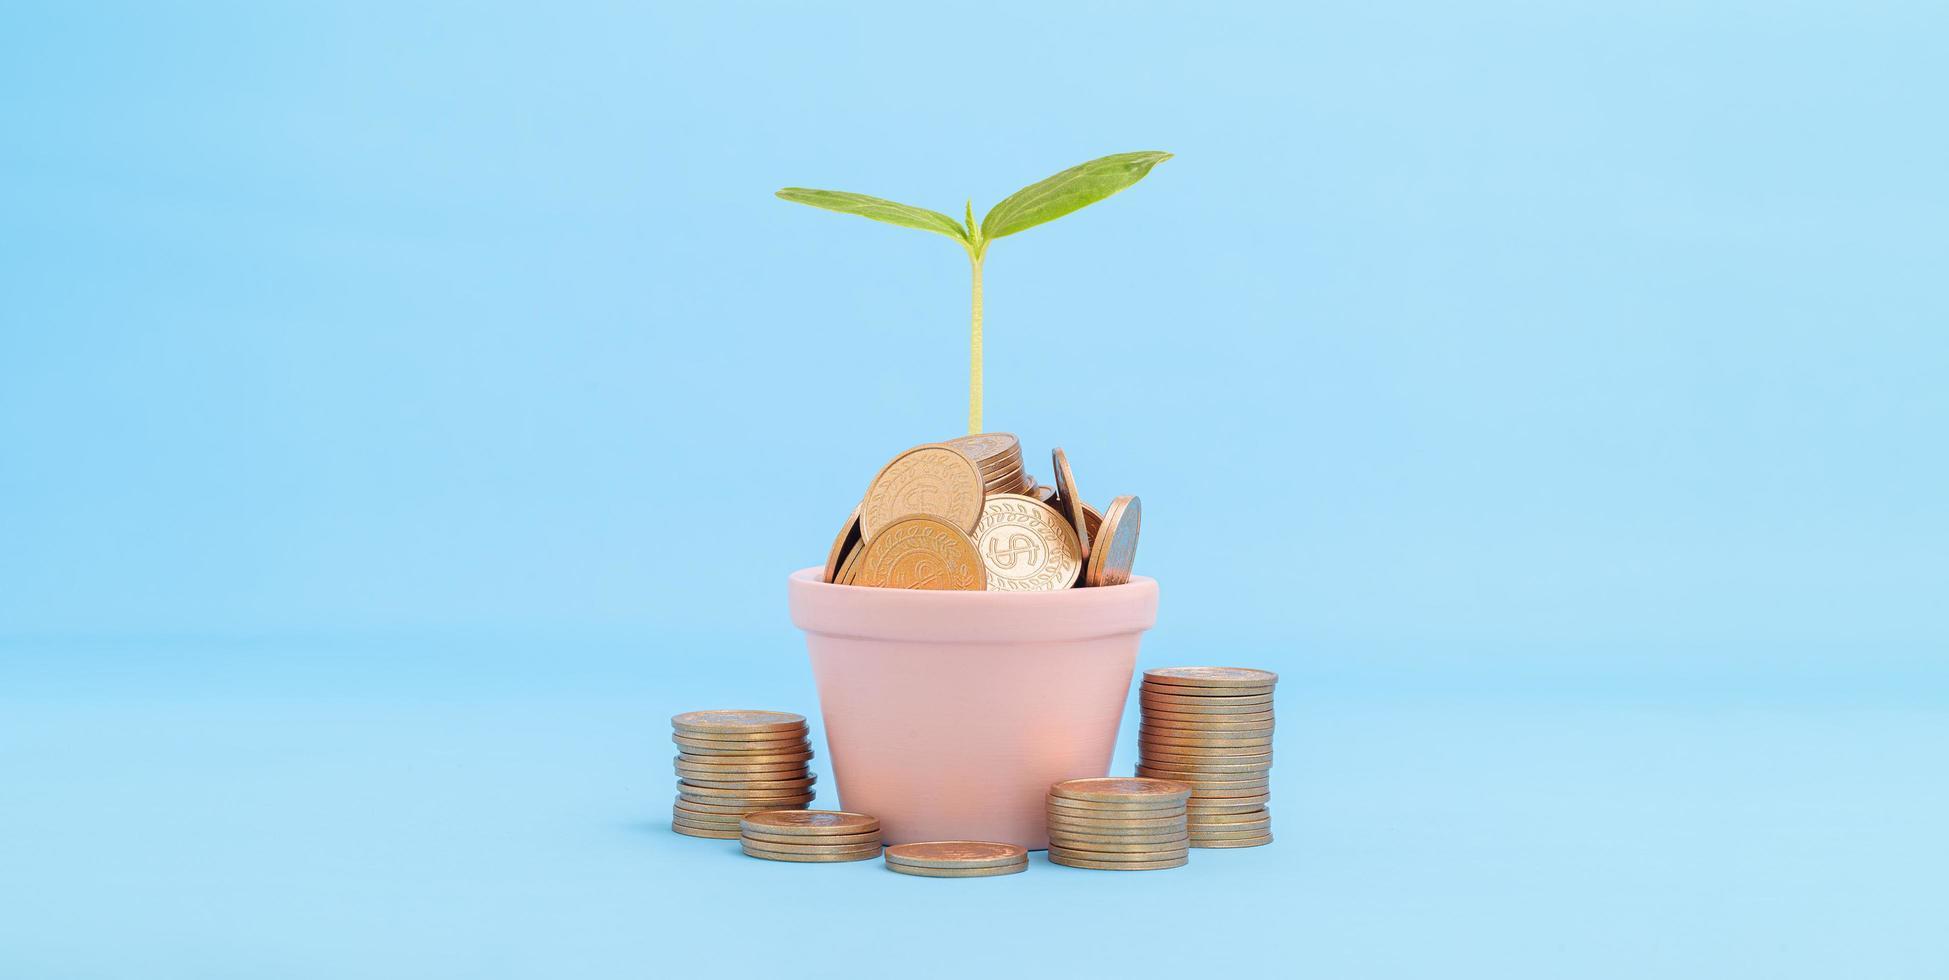 koncept lager investering samla pengar staplade mynt foto